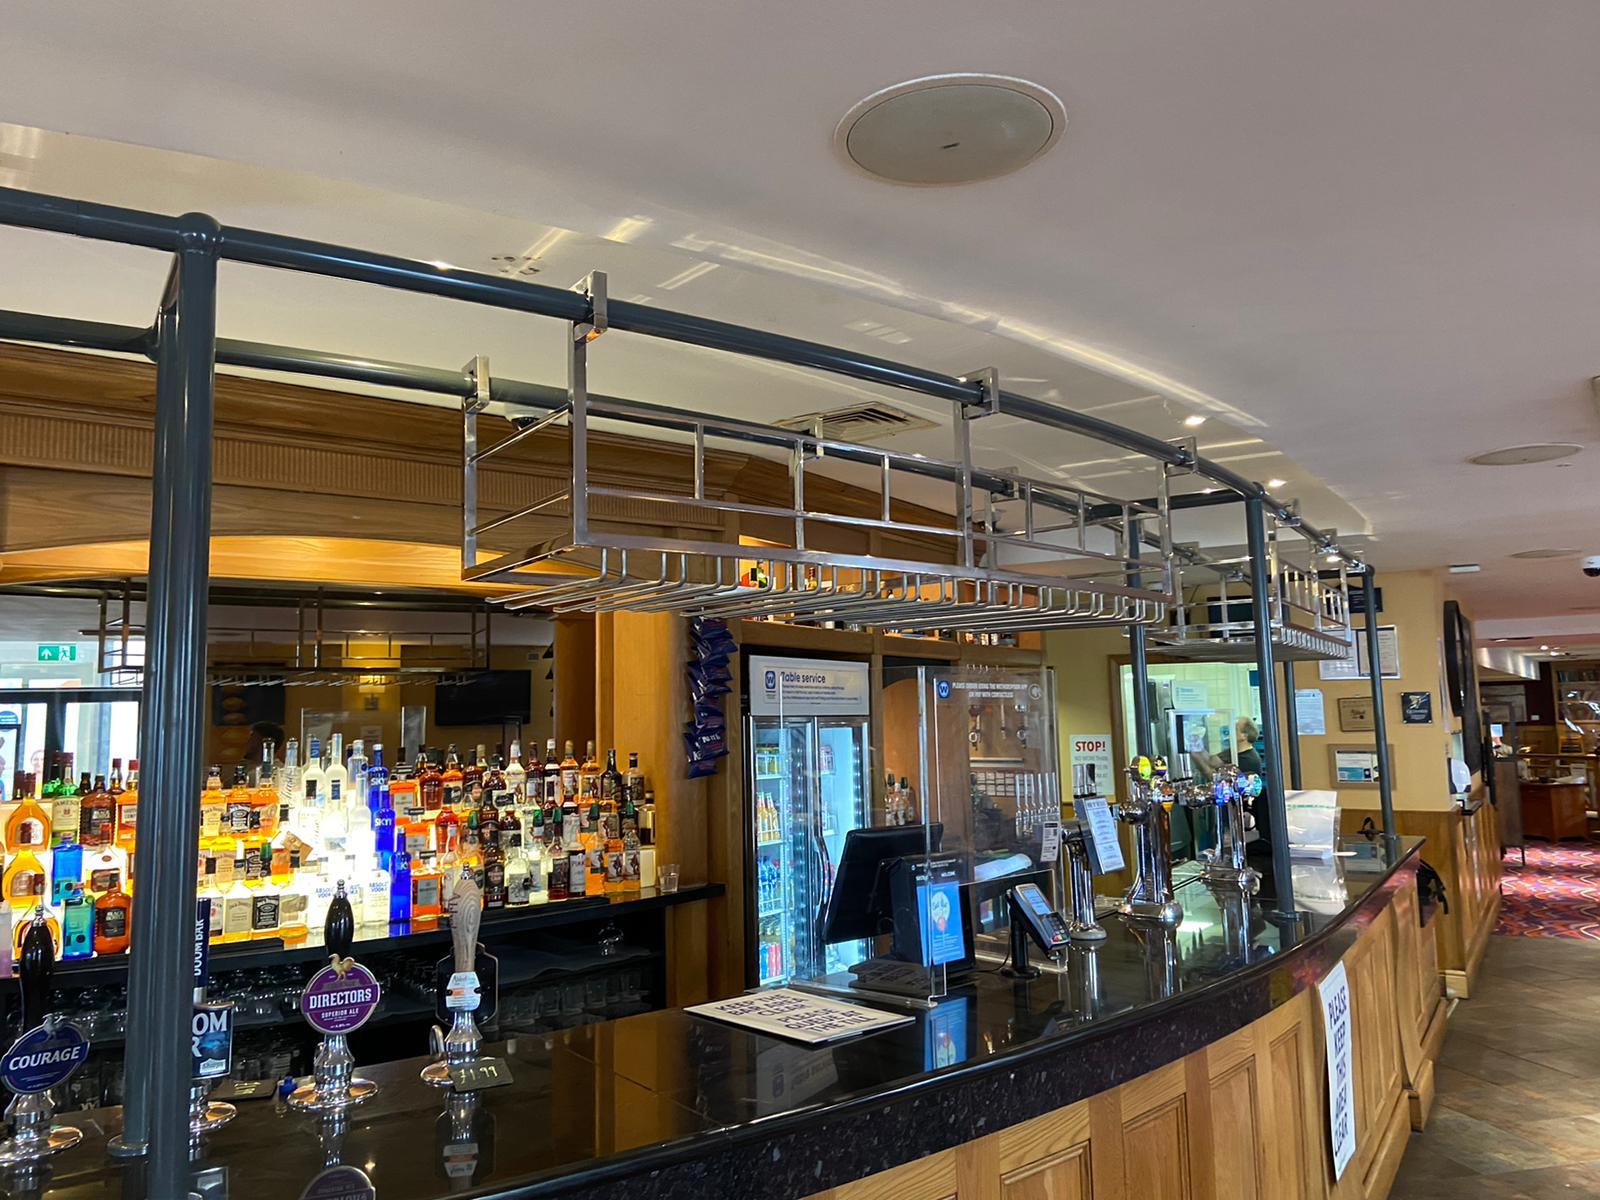 Polished stainless steel glass racks